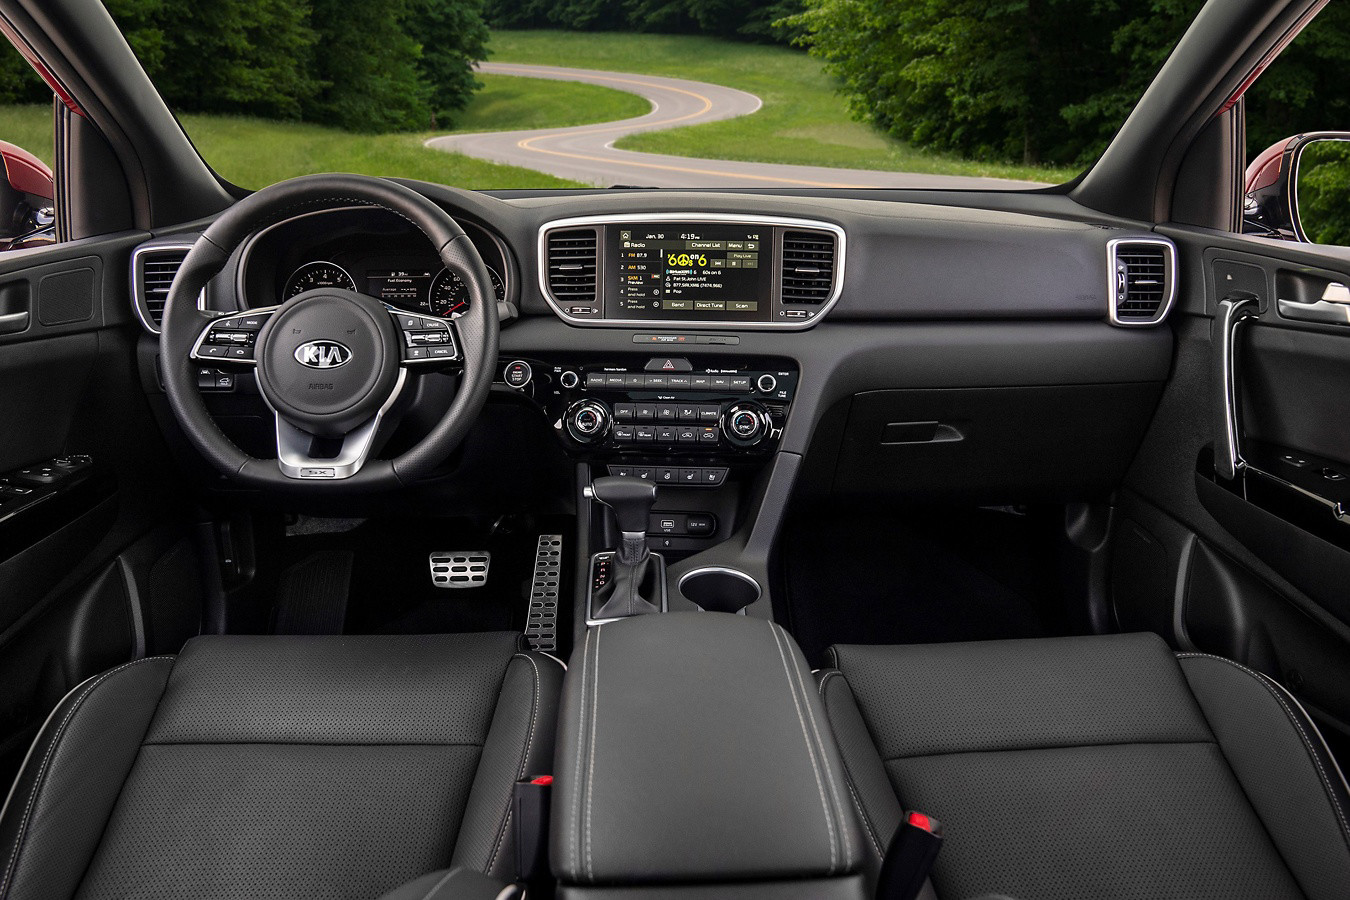 2020 Kia Sportage Interior Front